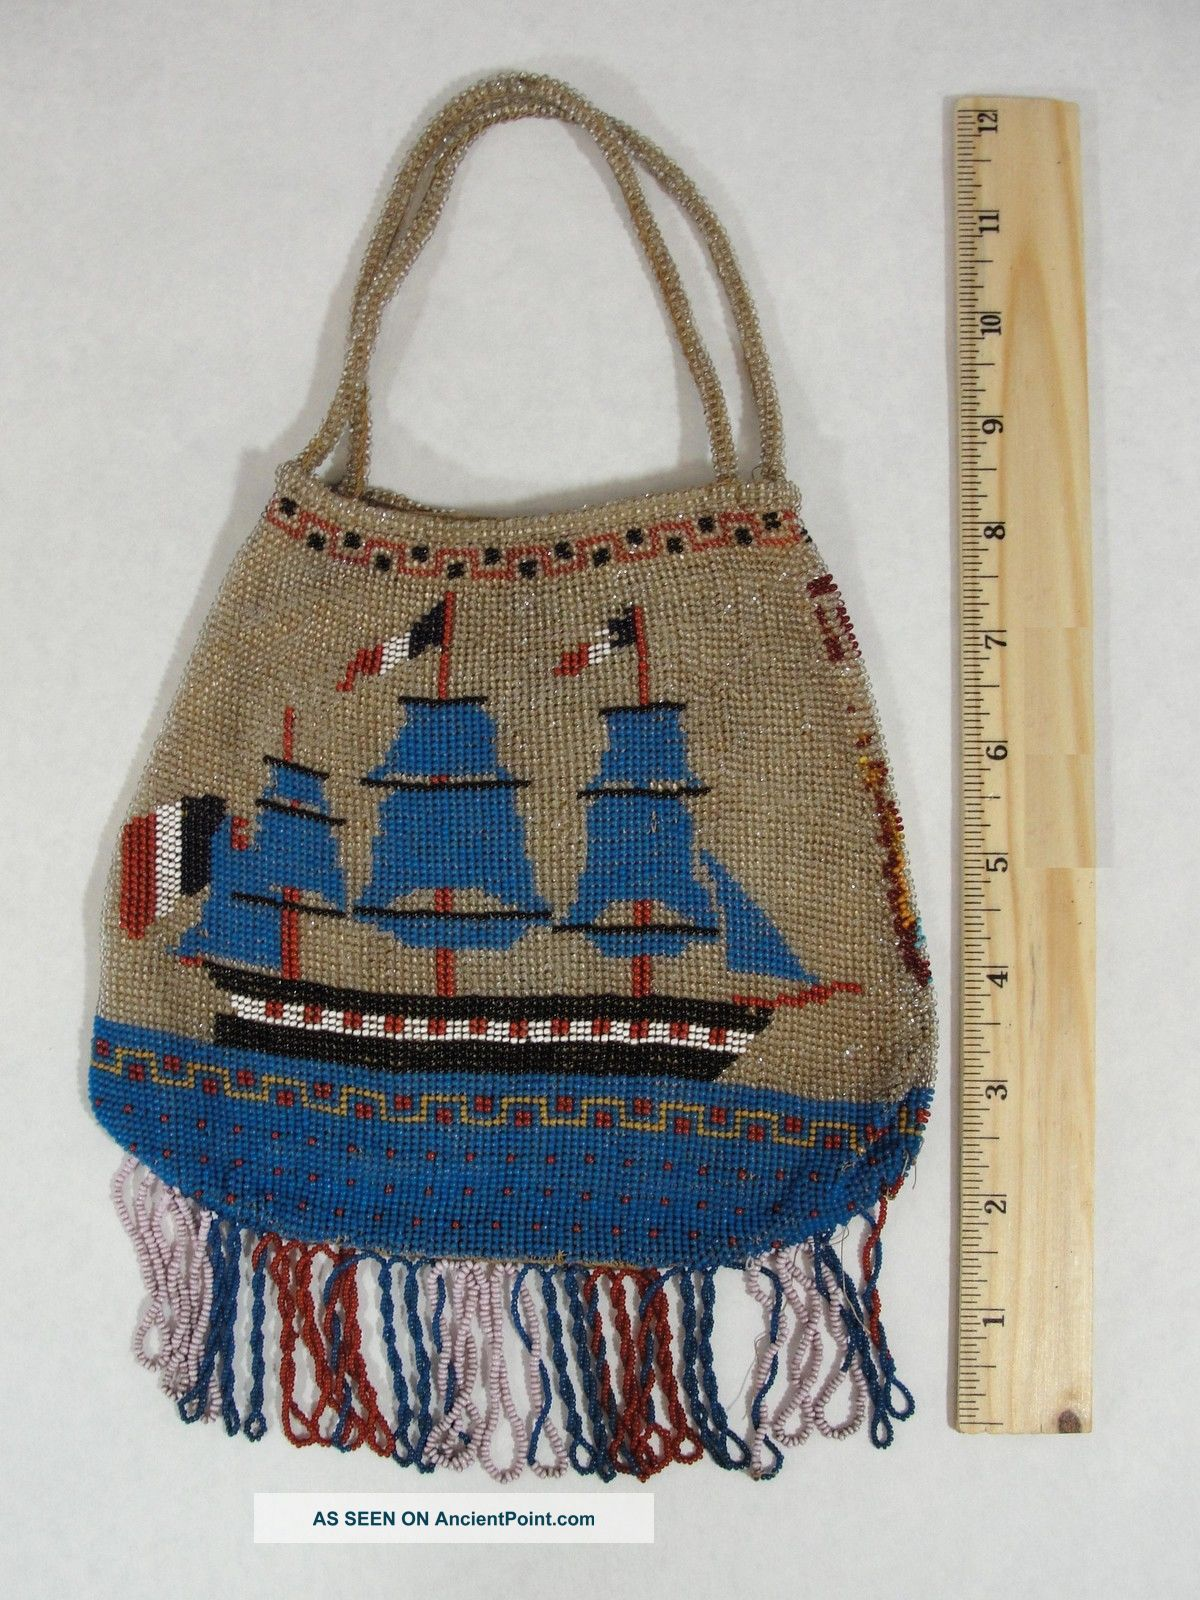 Rare Antique 19thc French,  Sailing Gun Ship & Flags Beaded Handbag,  Pocketbook Folk Art photo